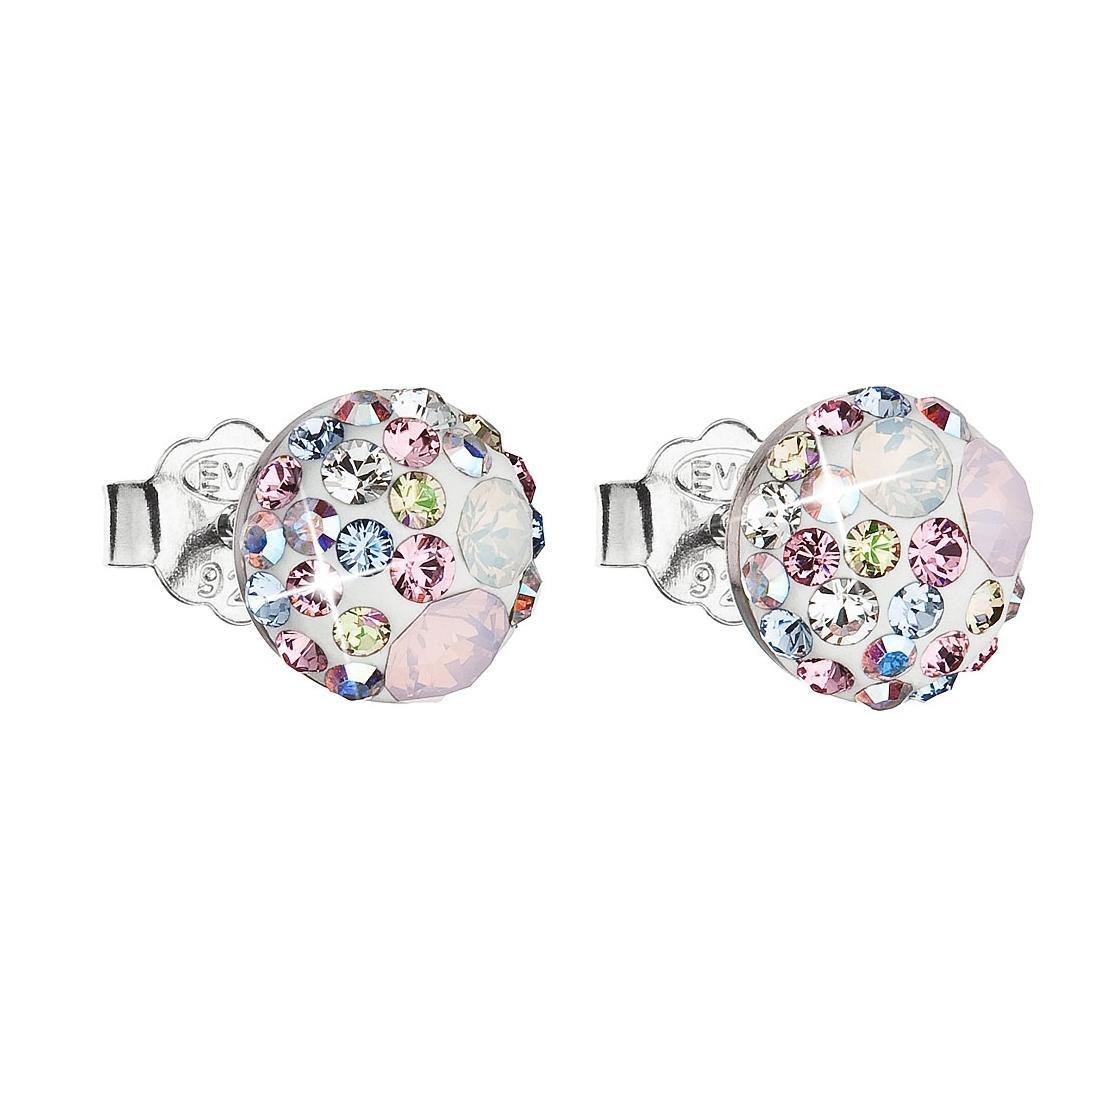 Stříbrné náušnice s krystaly Crystals from Swarovski®, Magic Rose EG2008-MR